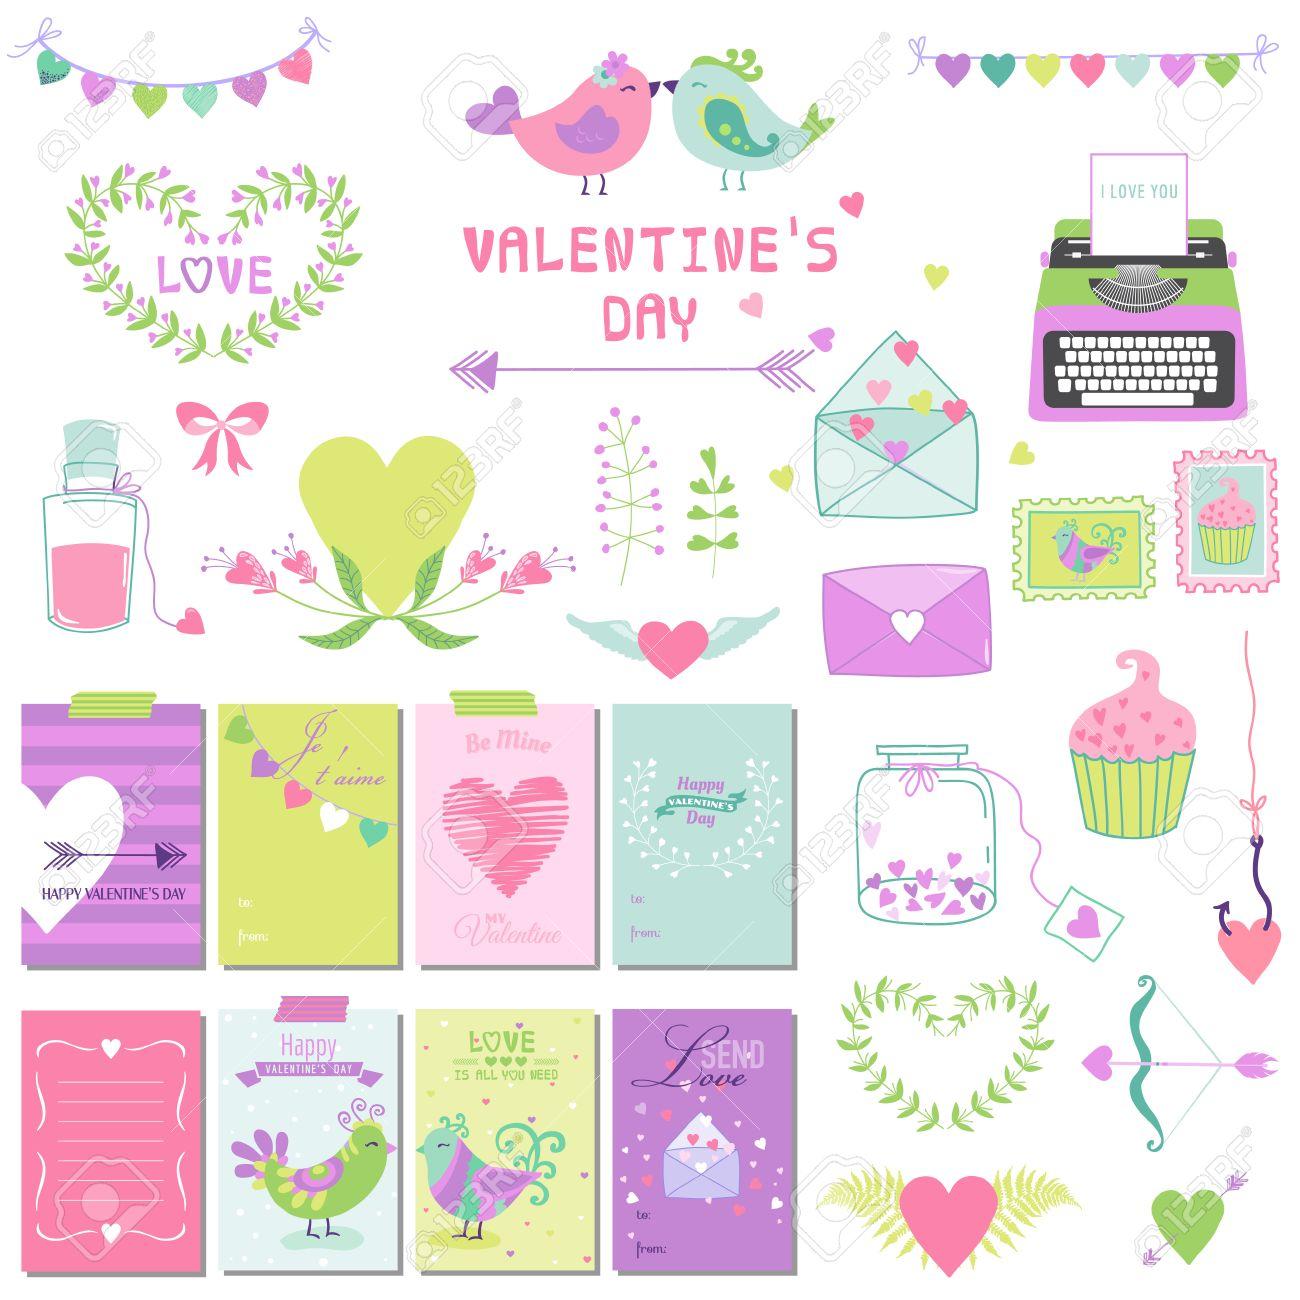 Scrapbook paper cooking - Scrapbook Paper Cute Valentines Day And Love Set For Design Scrapbooking In Vector